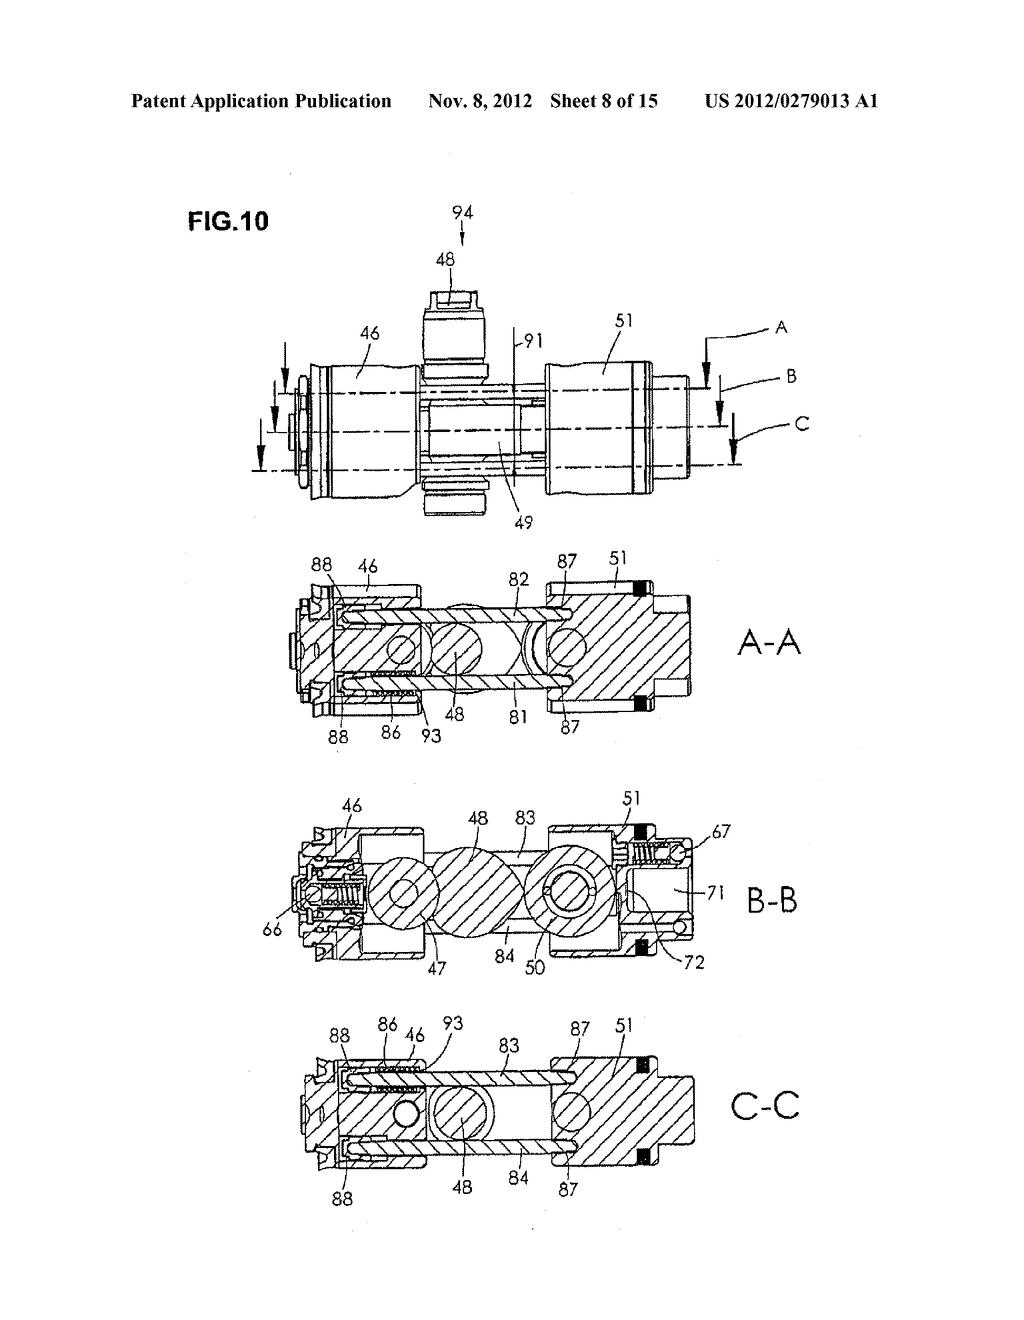 Hydraulic Directional Solenoid Valve And Door Closer Having A Diagram Schematic Image 09